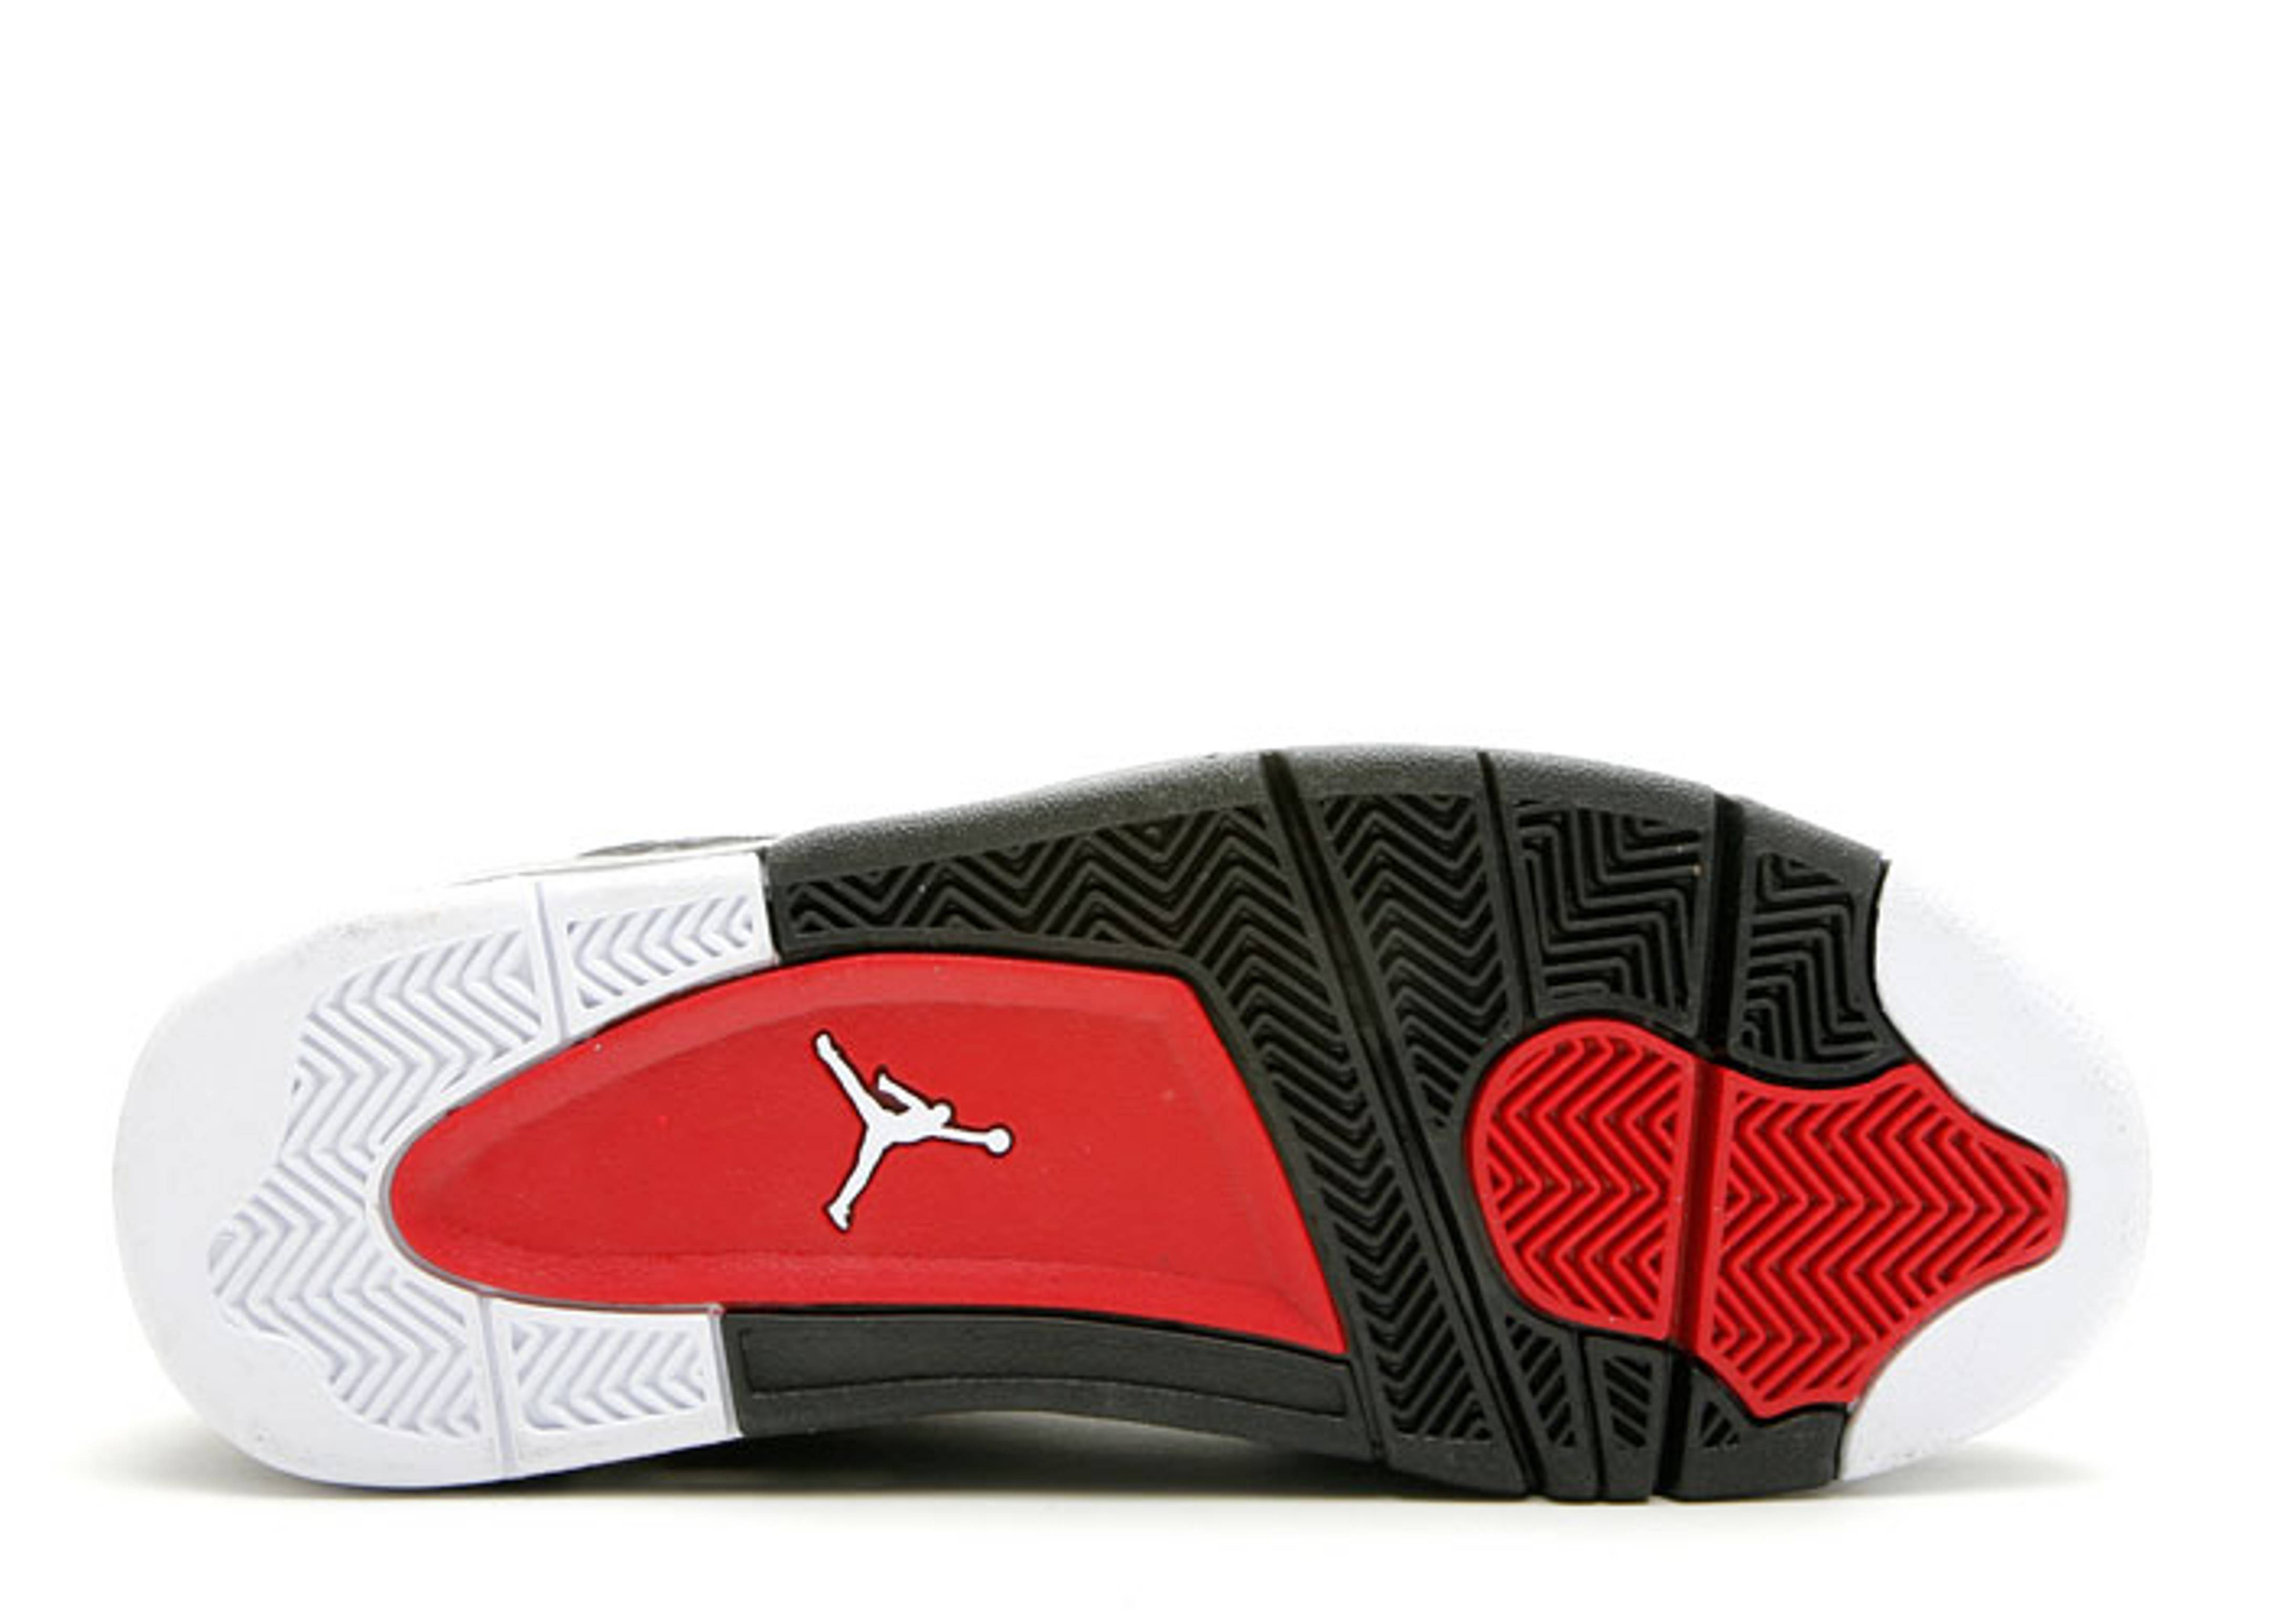 low priced 3cd58 91379 Dub Zero - Air Jordan - 311046 061 - black varsity red-white ...